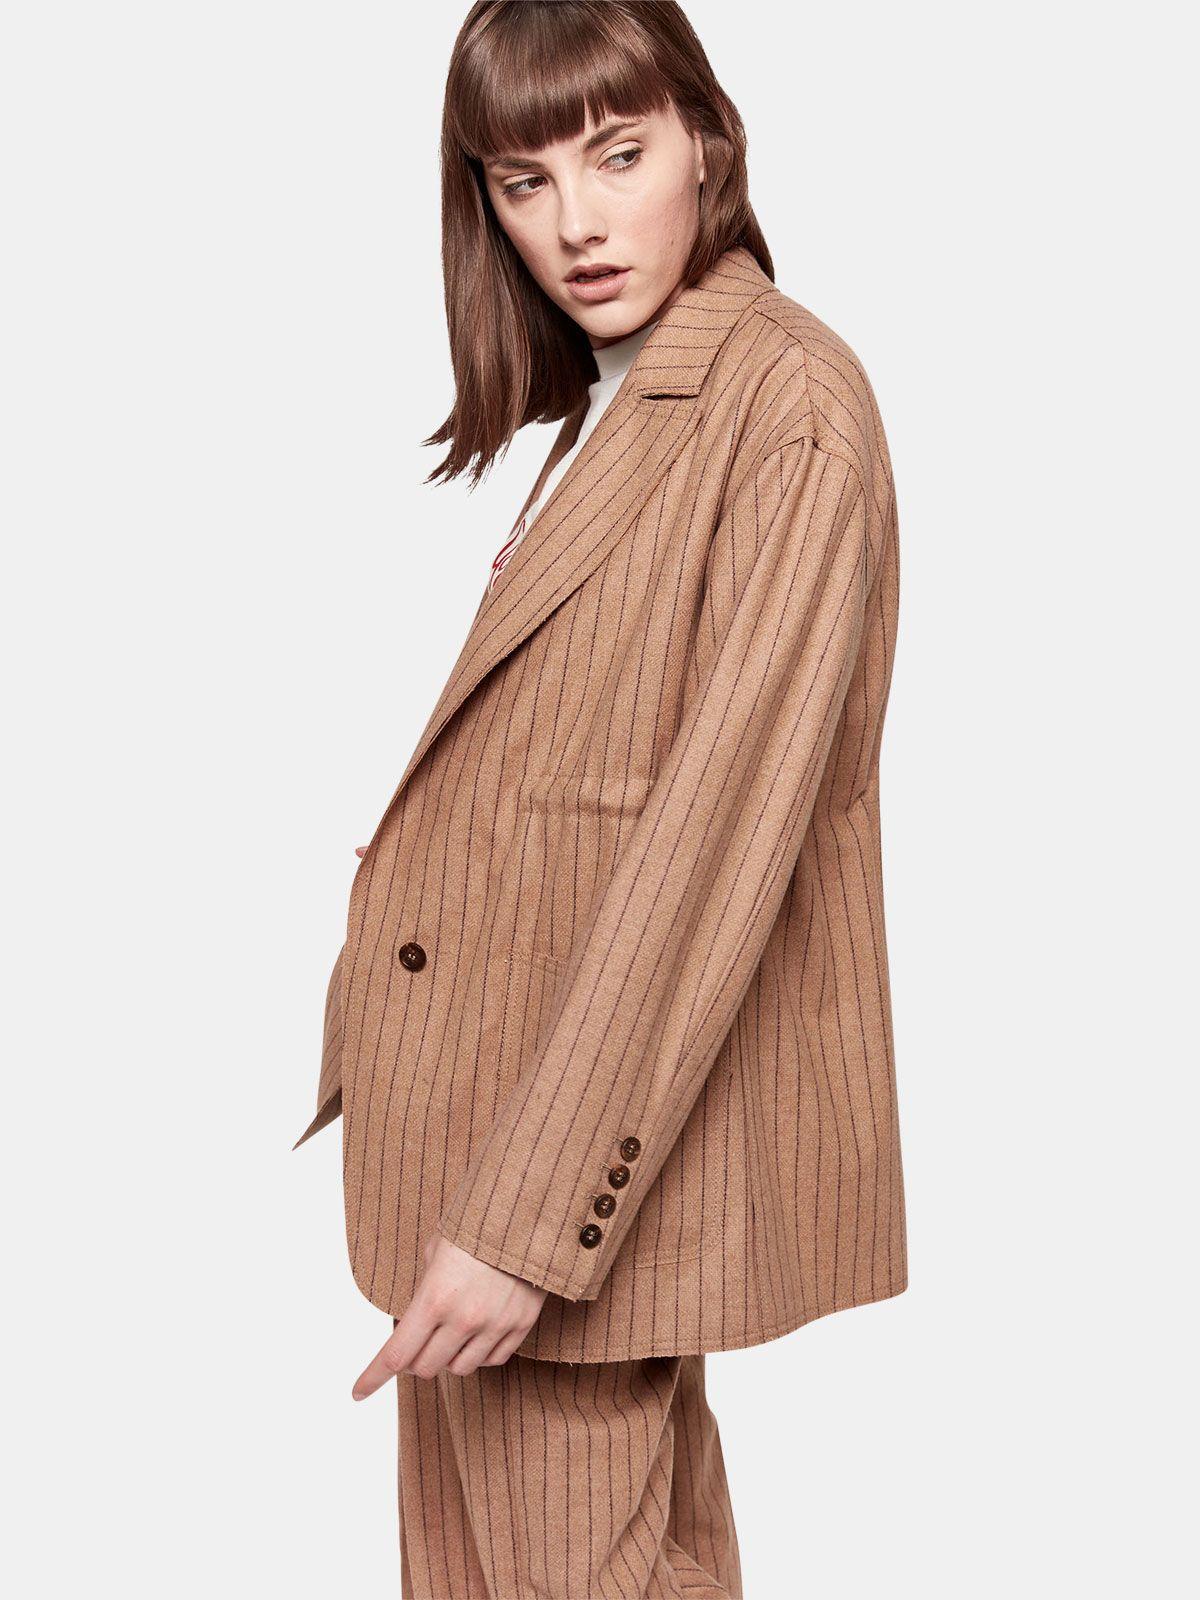 Golden Goose - Matsu oversized jacket in pin striped wool in